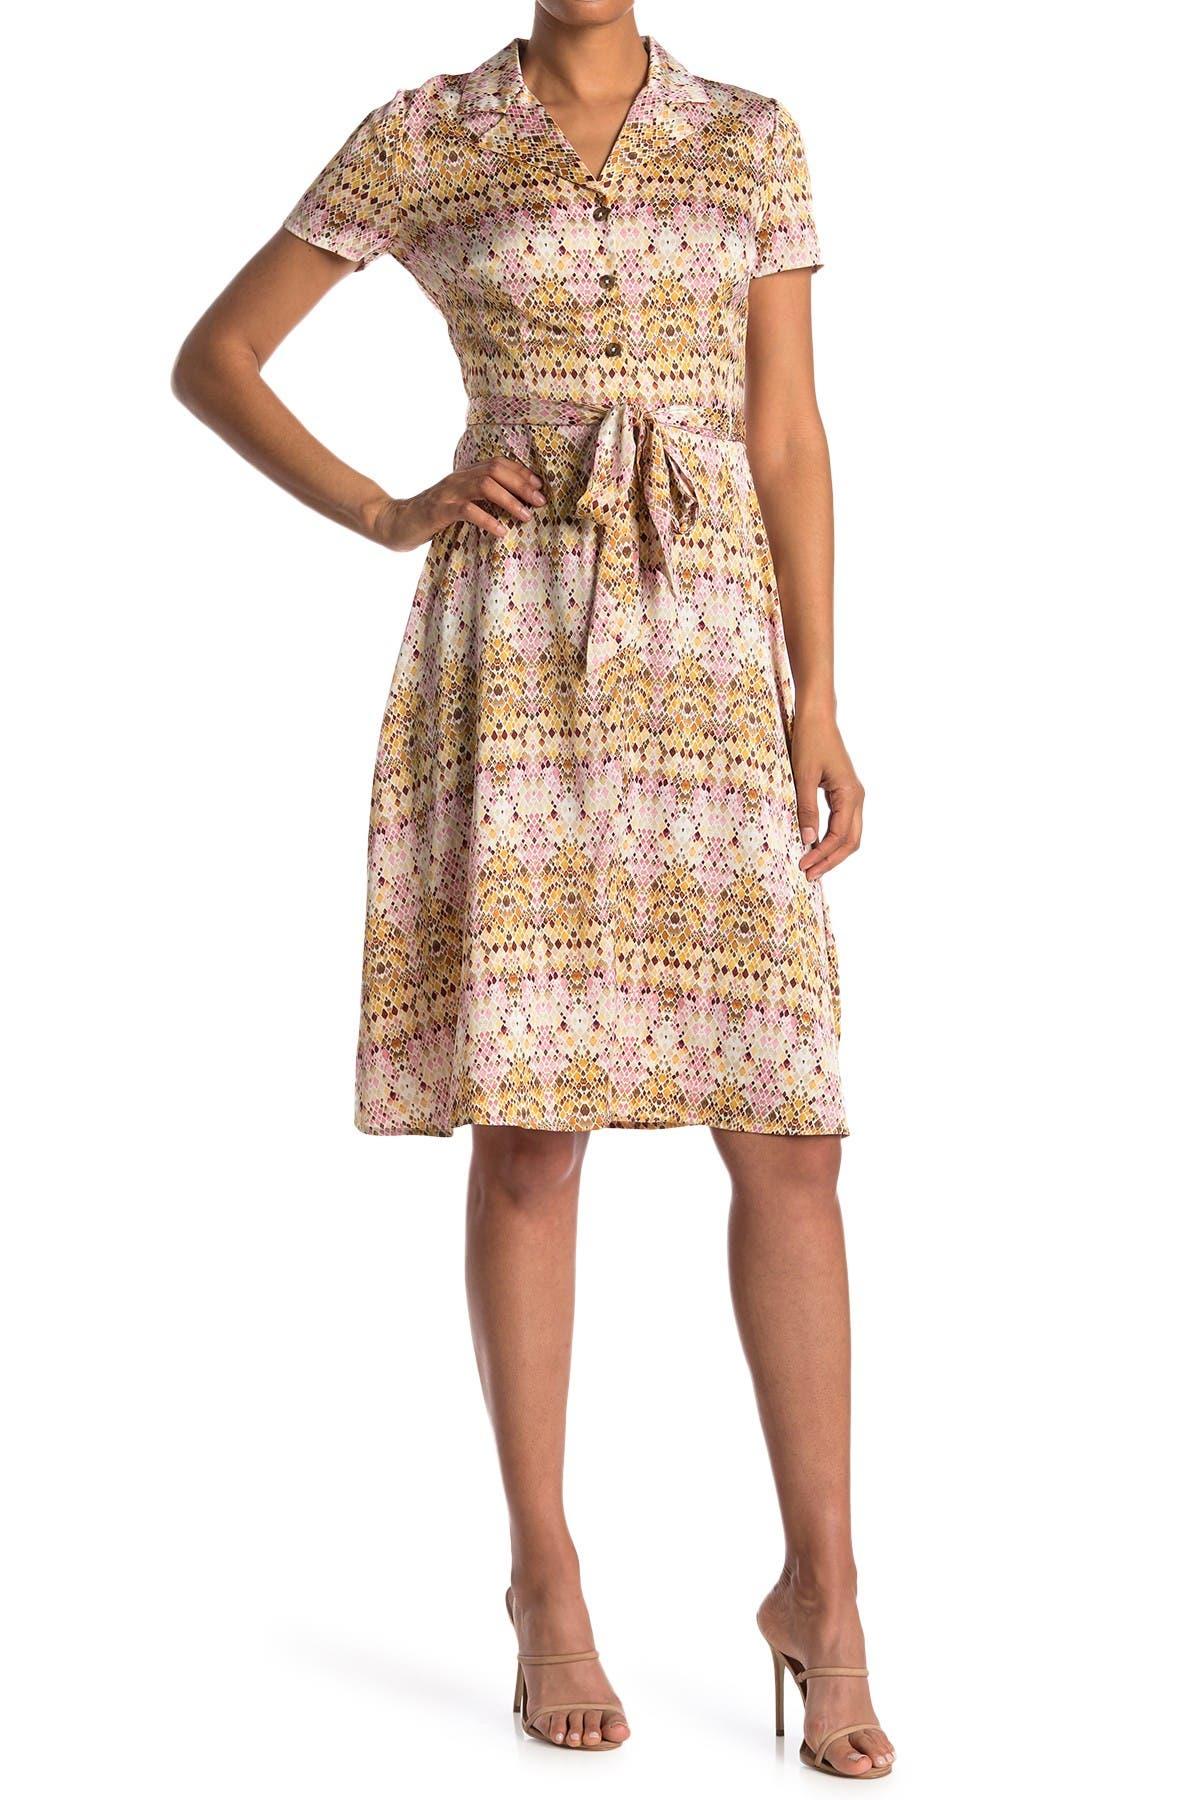 Image of London Times Notch Collar Short Sleeve Geometric Print Dress